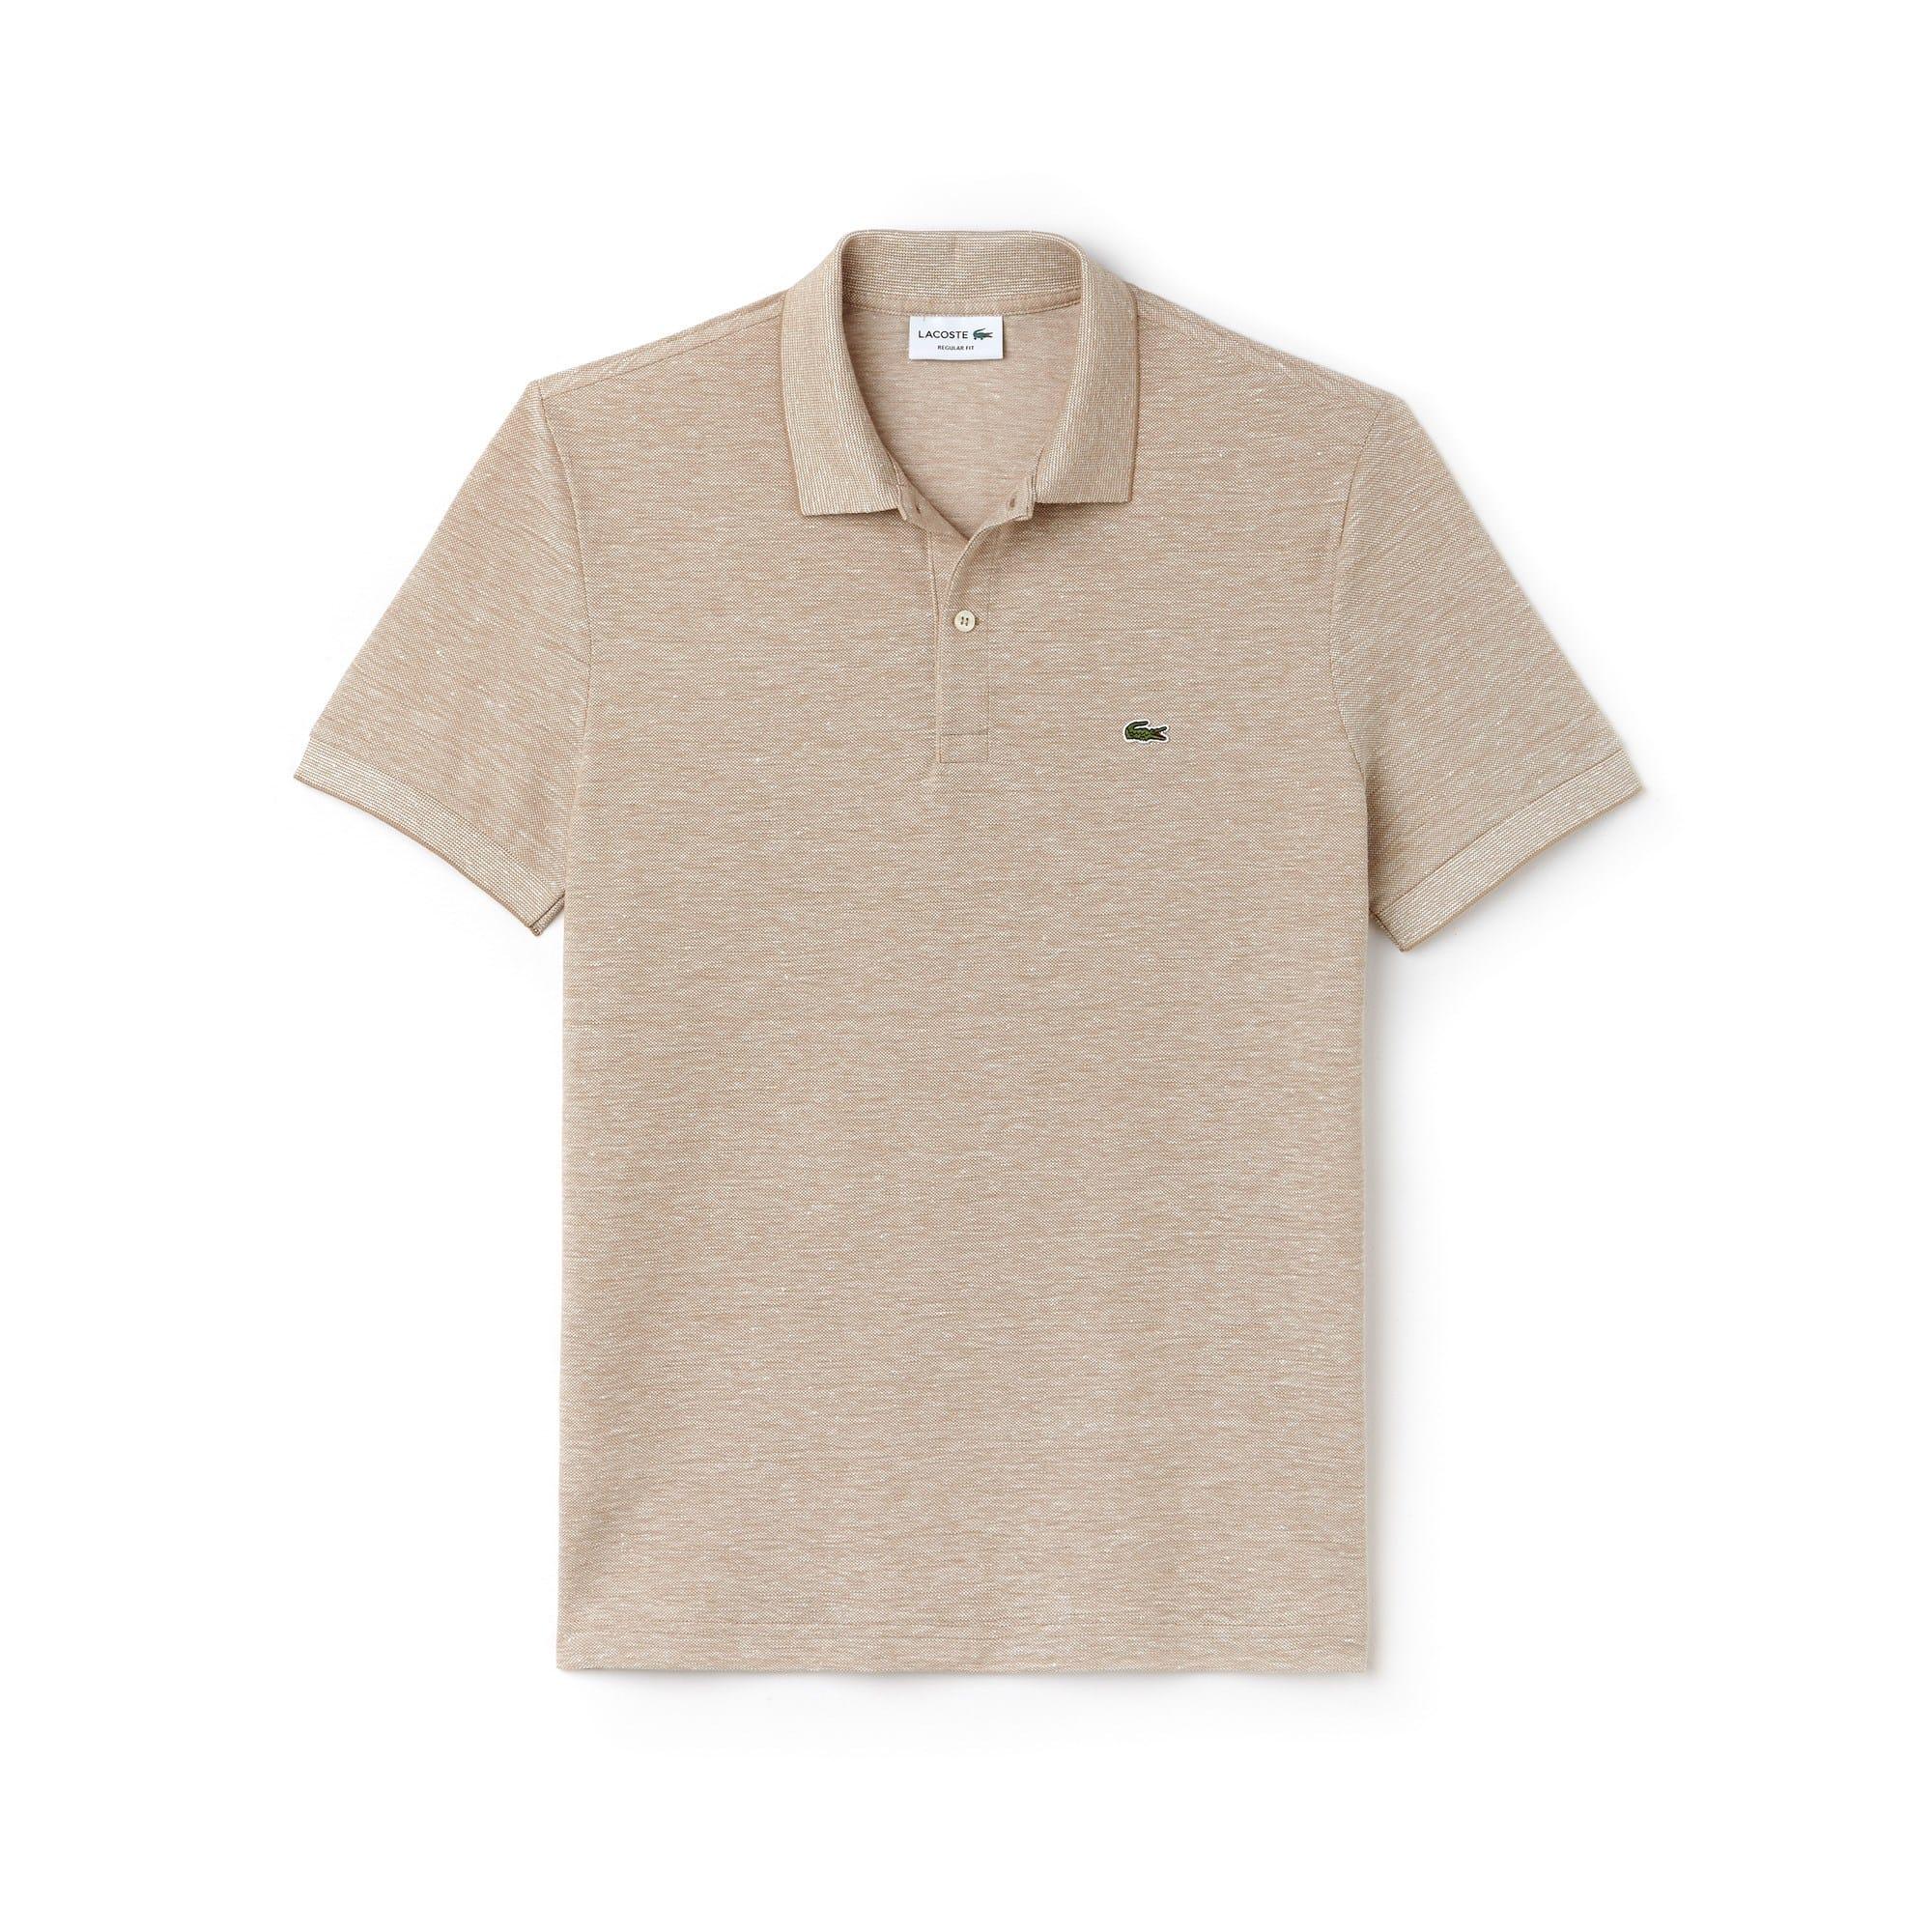 Regular Fit Herren-Poloshirt aus strukturiertem Kaviar-Piqué